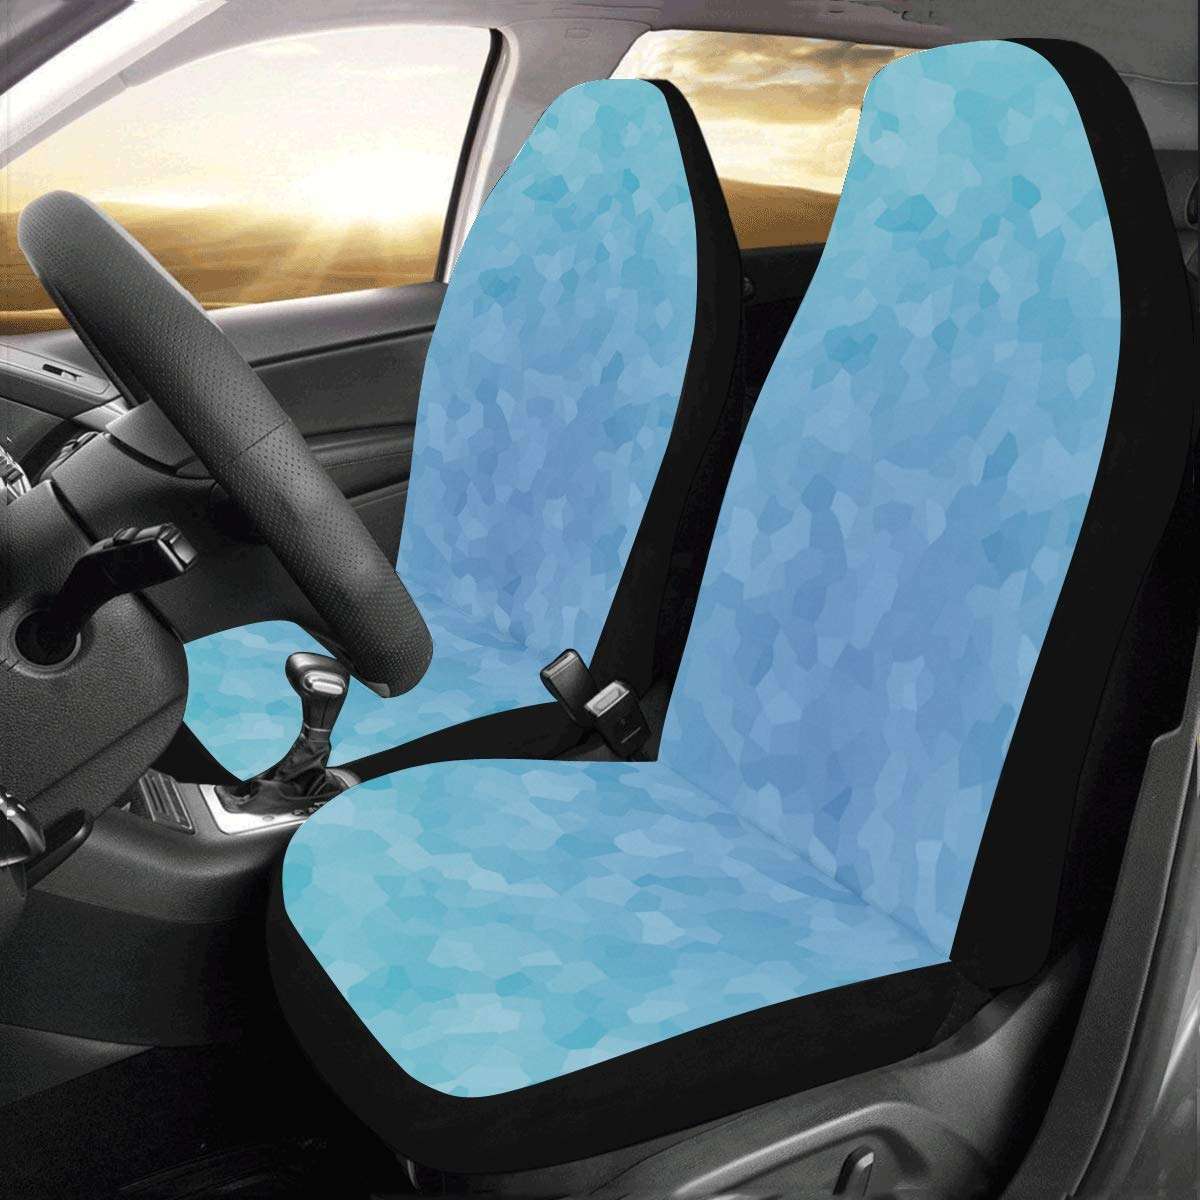 SUV Sedan Van Cozeyat Blue Aqua Flower Auto Seat Covers Cool Vehicle Seat Protector Full Set of 2 Fit Most Cars